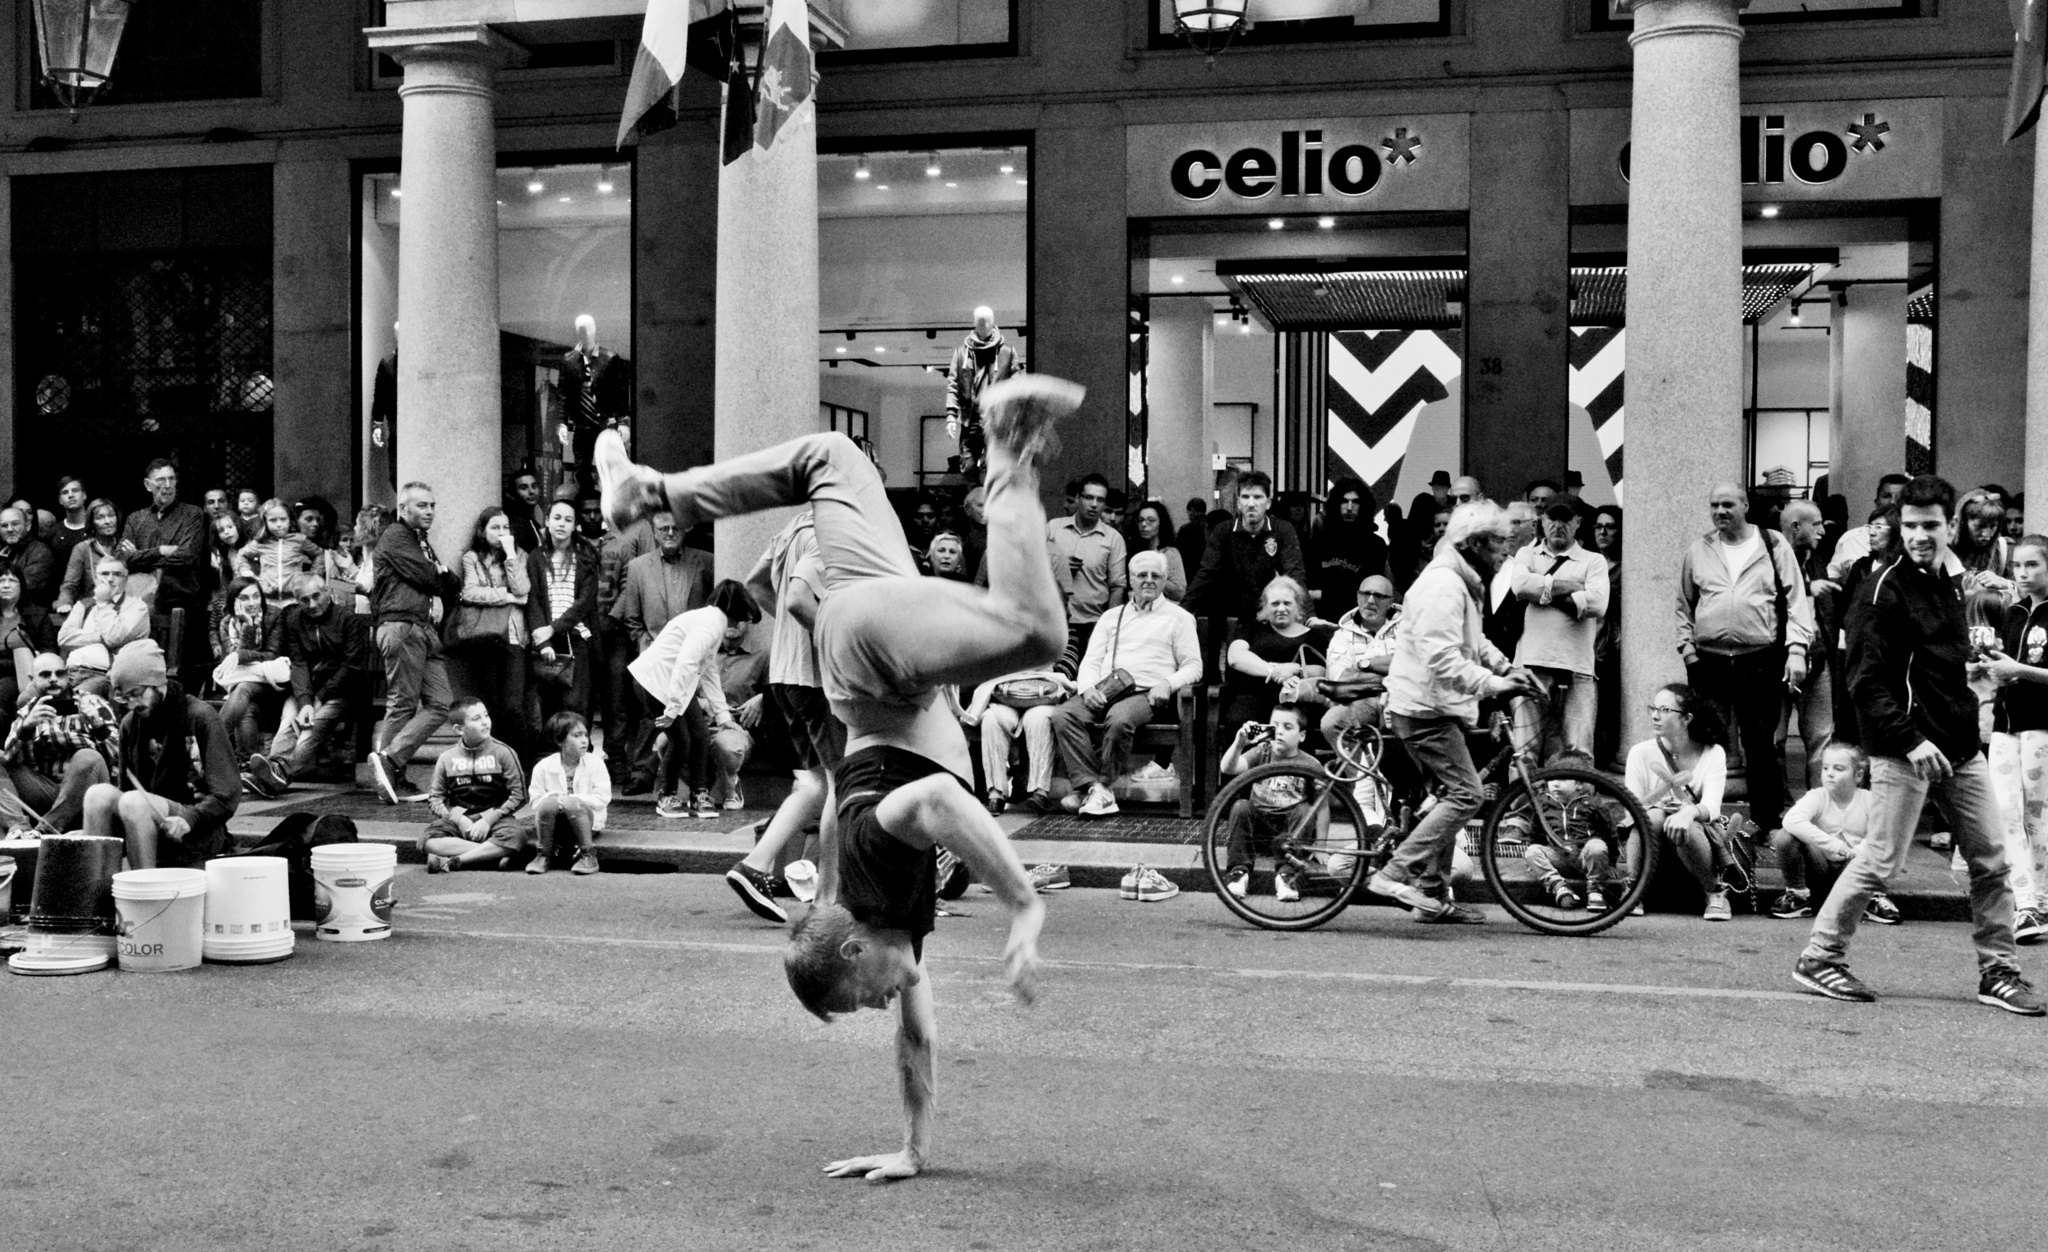 street dance by lorena.rinaudo.9